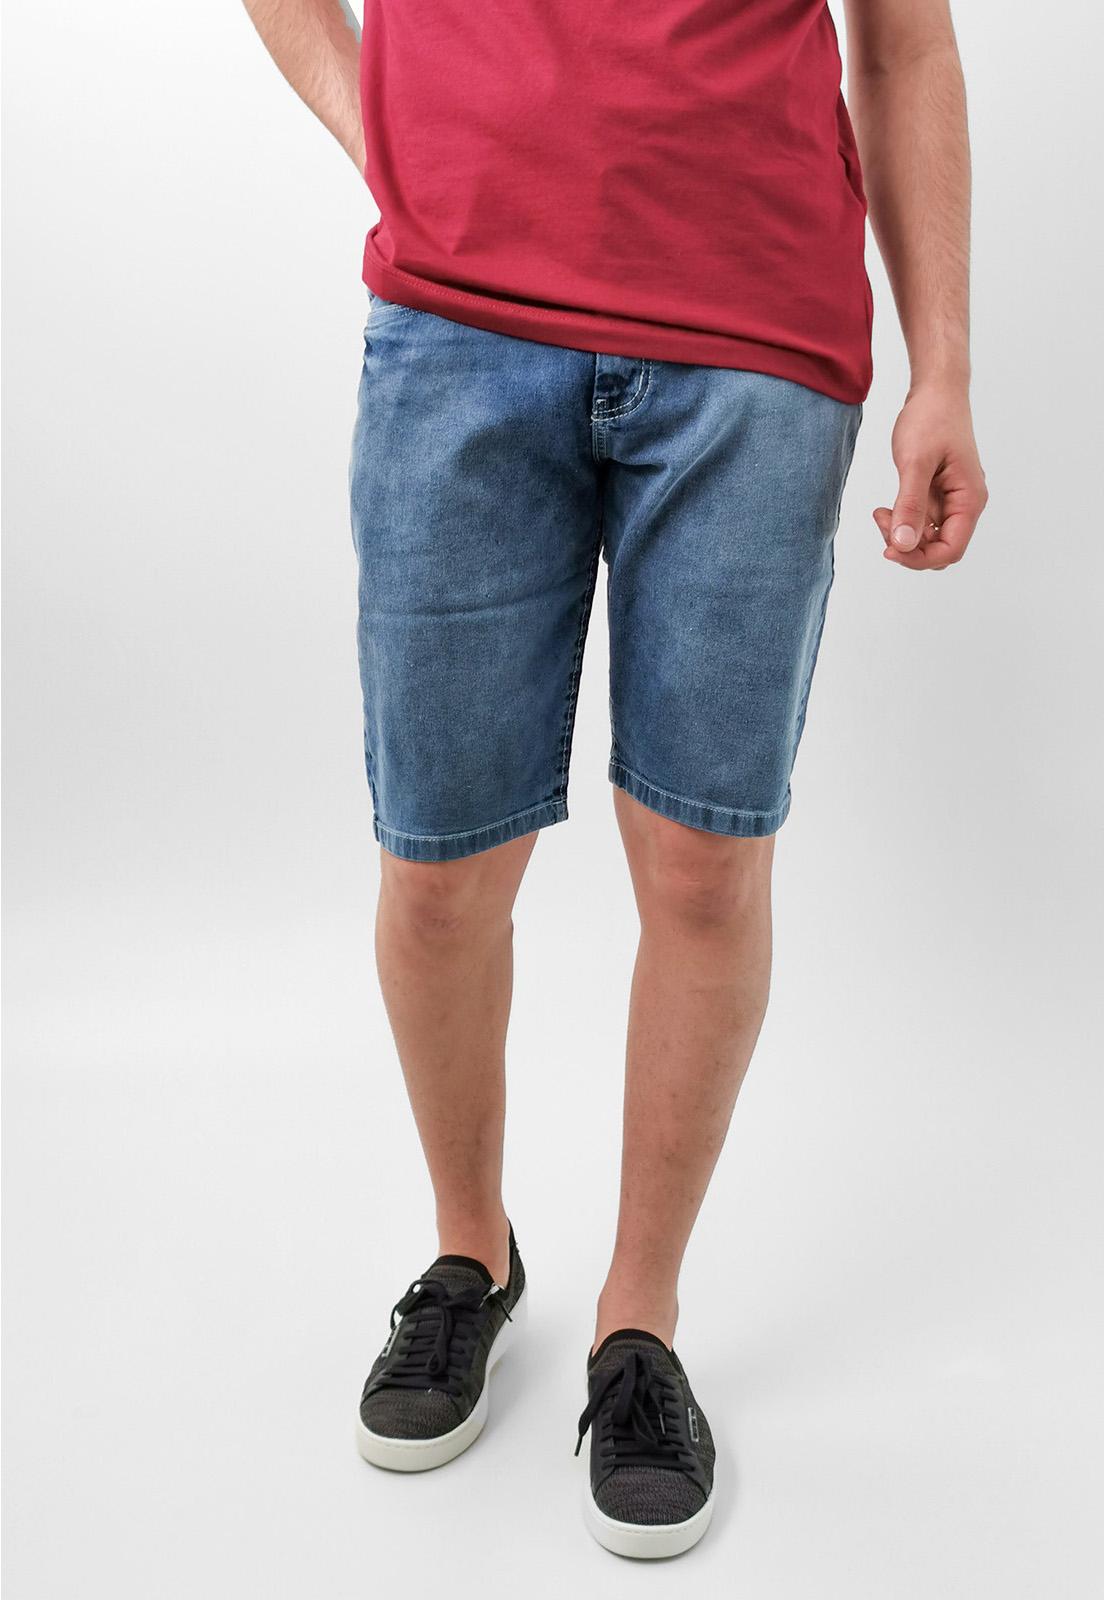 Bermuda Jeans Pitt Stoned